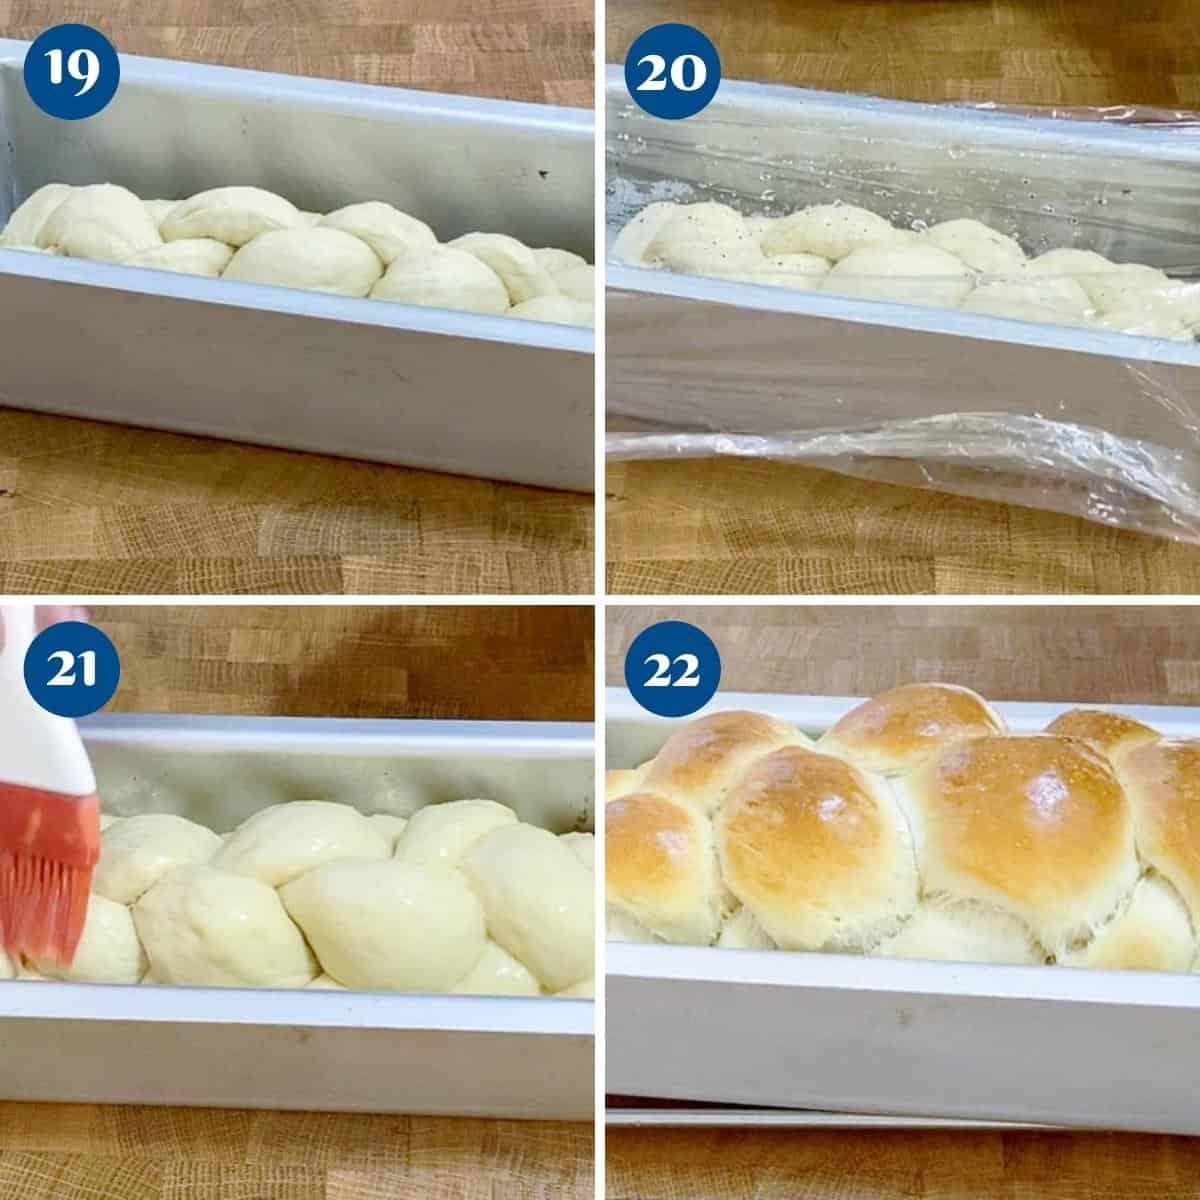 Progress picture collage for braided sandwich bread.